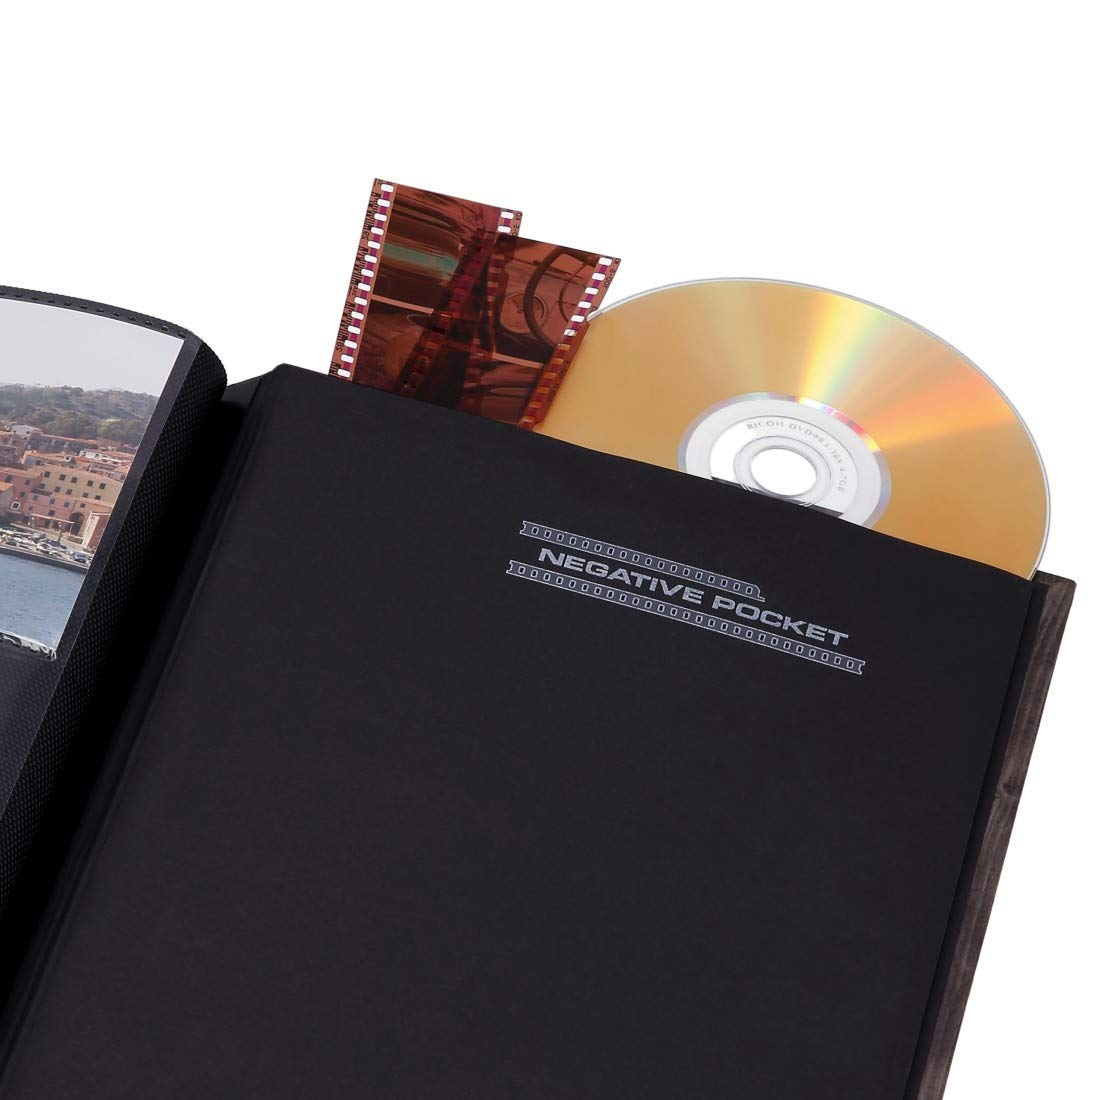 Memo Album with 100 Black Pages Hama Batzi Slip-In Photo Album for Inserting 200 Photos in 10 x 15 cm Format Teddy Bear Motif 19 x 25 cm CD Pocket